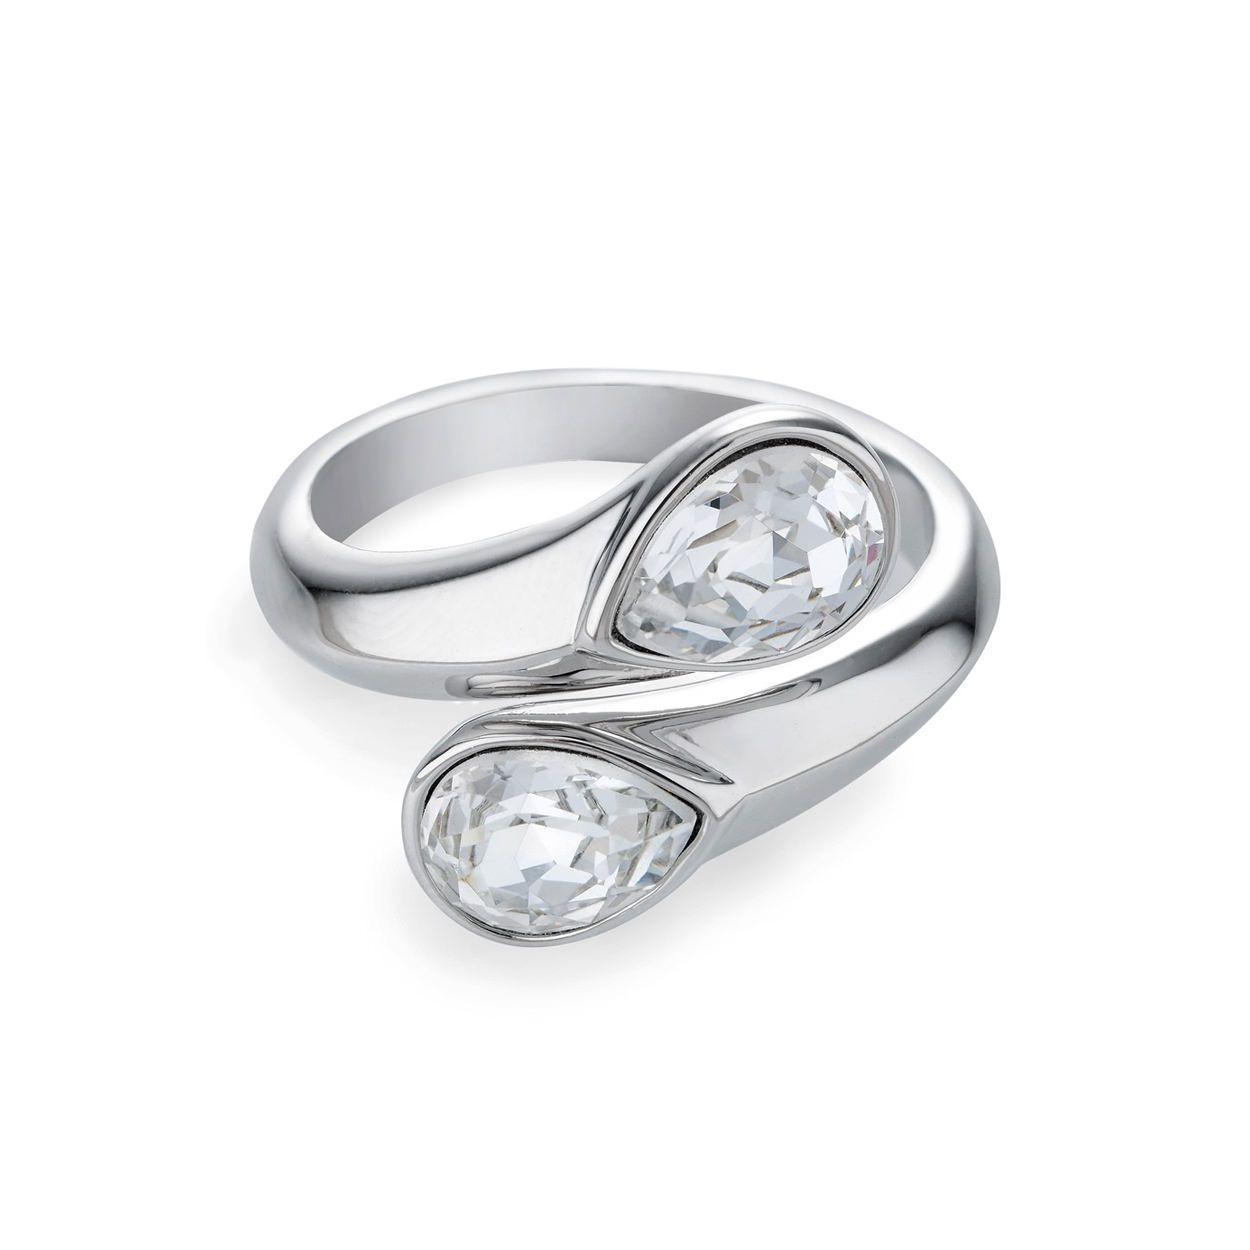 Buckley London Hatton Ring